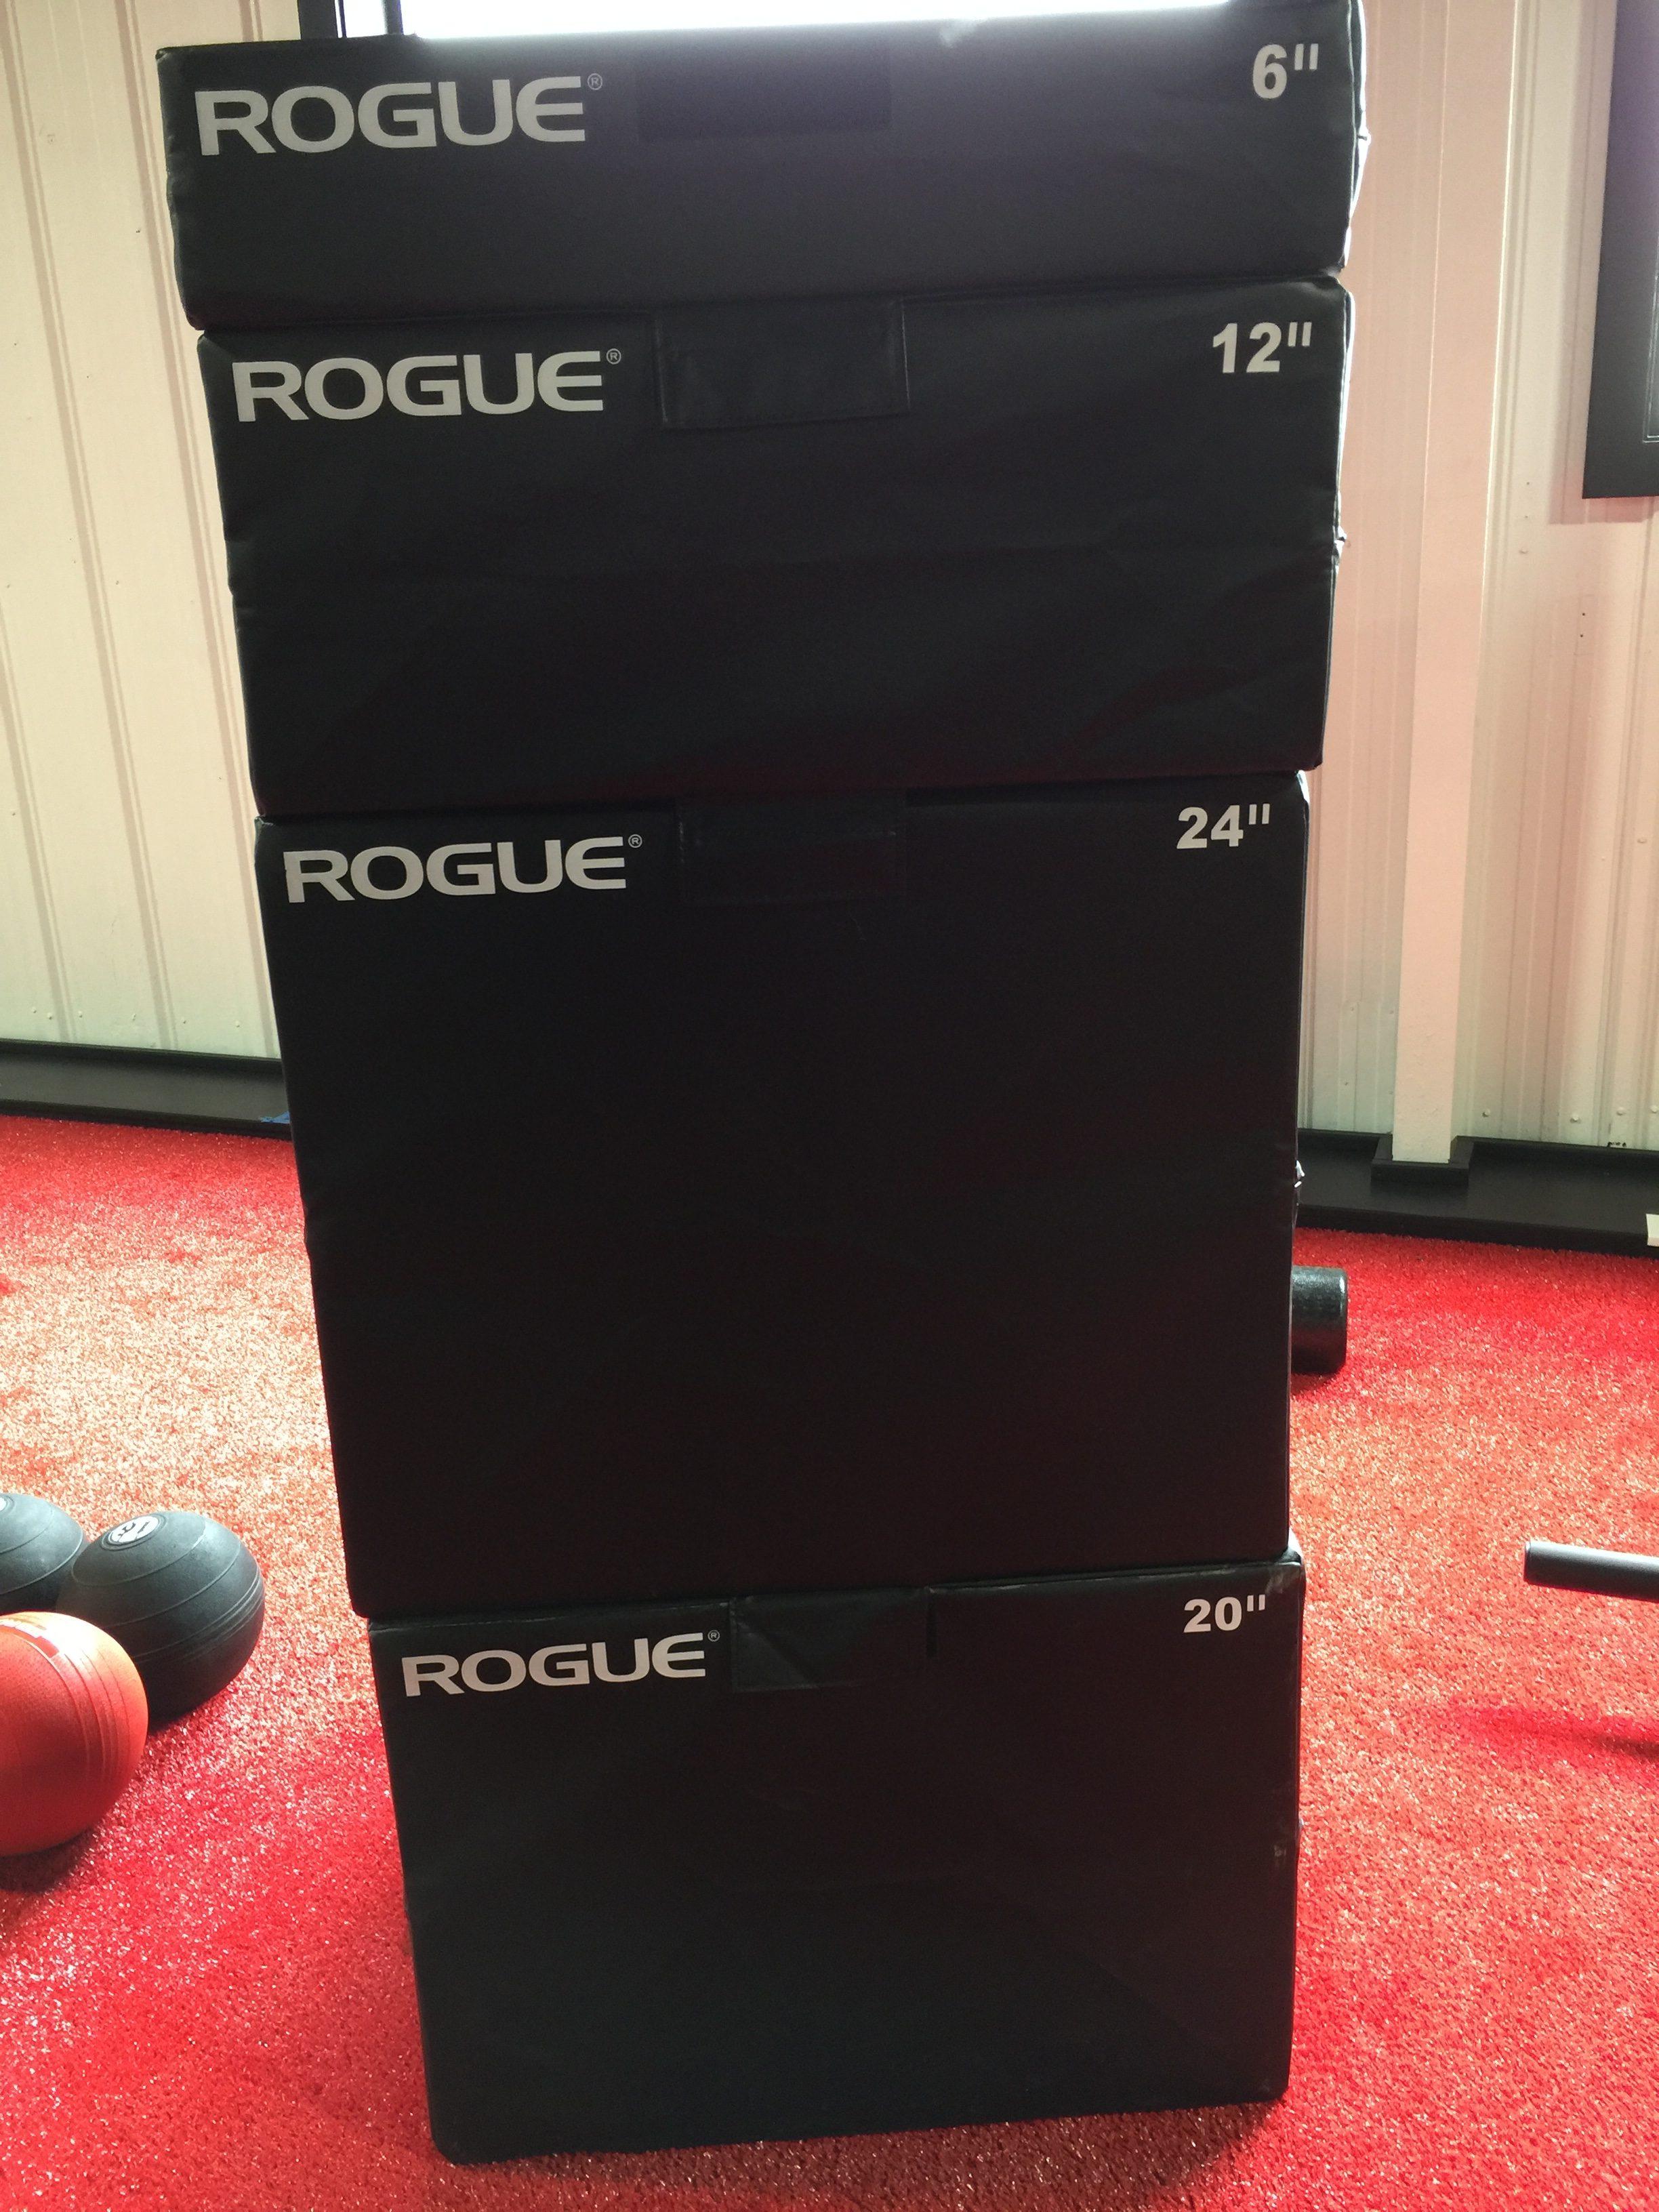 Rogue Foam Plyometric Boxes